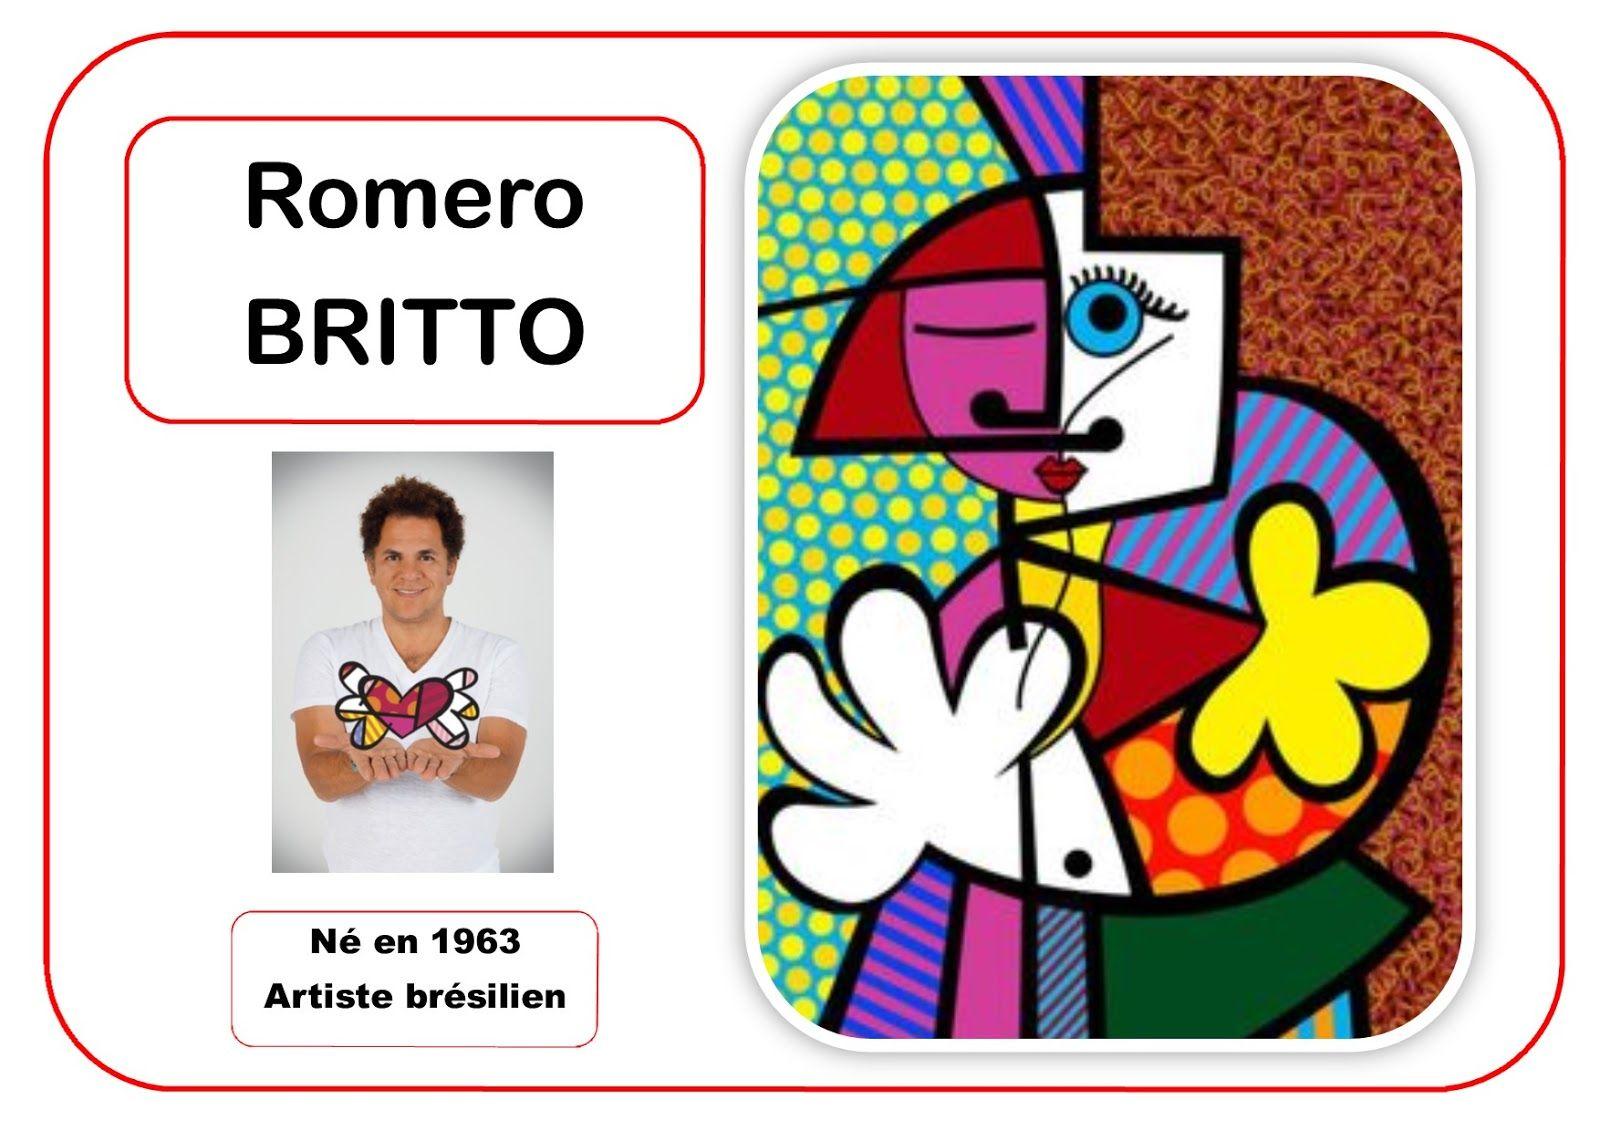 Coloriage coeur romero britto 30000 collections de pages colorier imprimables - Coloriage fleur britto ...